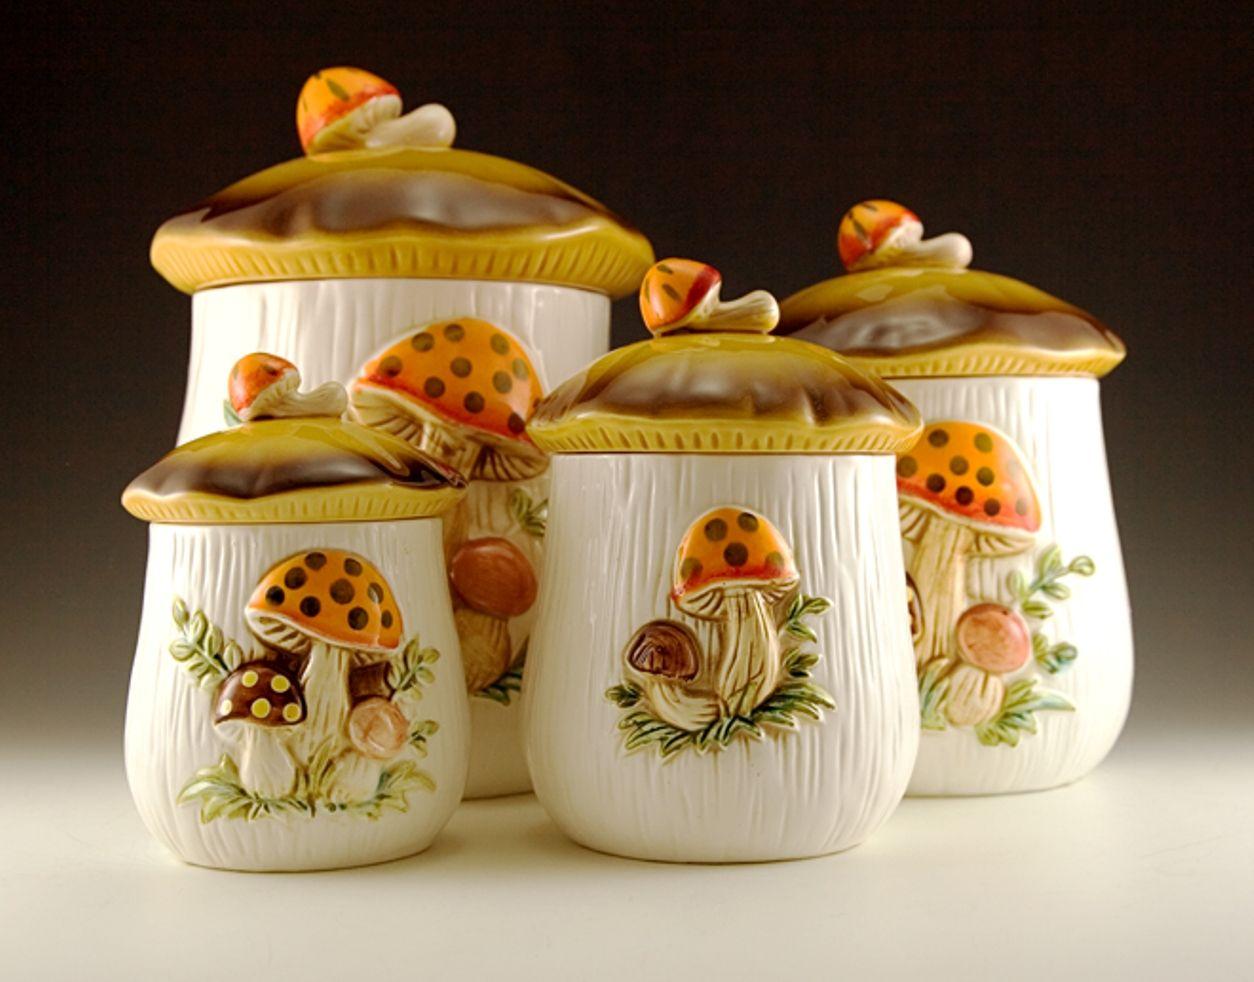 Mushroom Design Stoneware Kitchen Canisters : Useful Storage ...